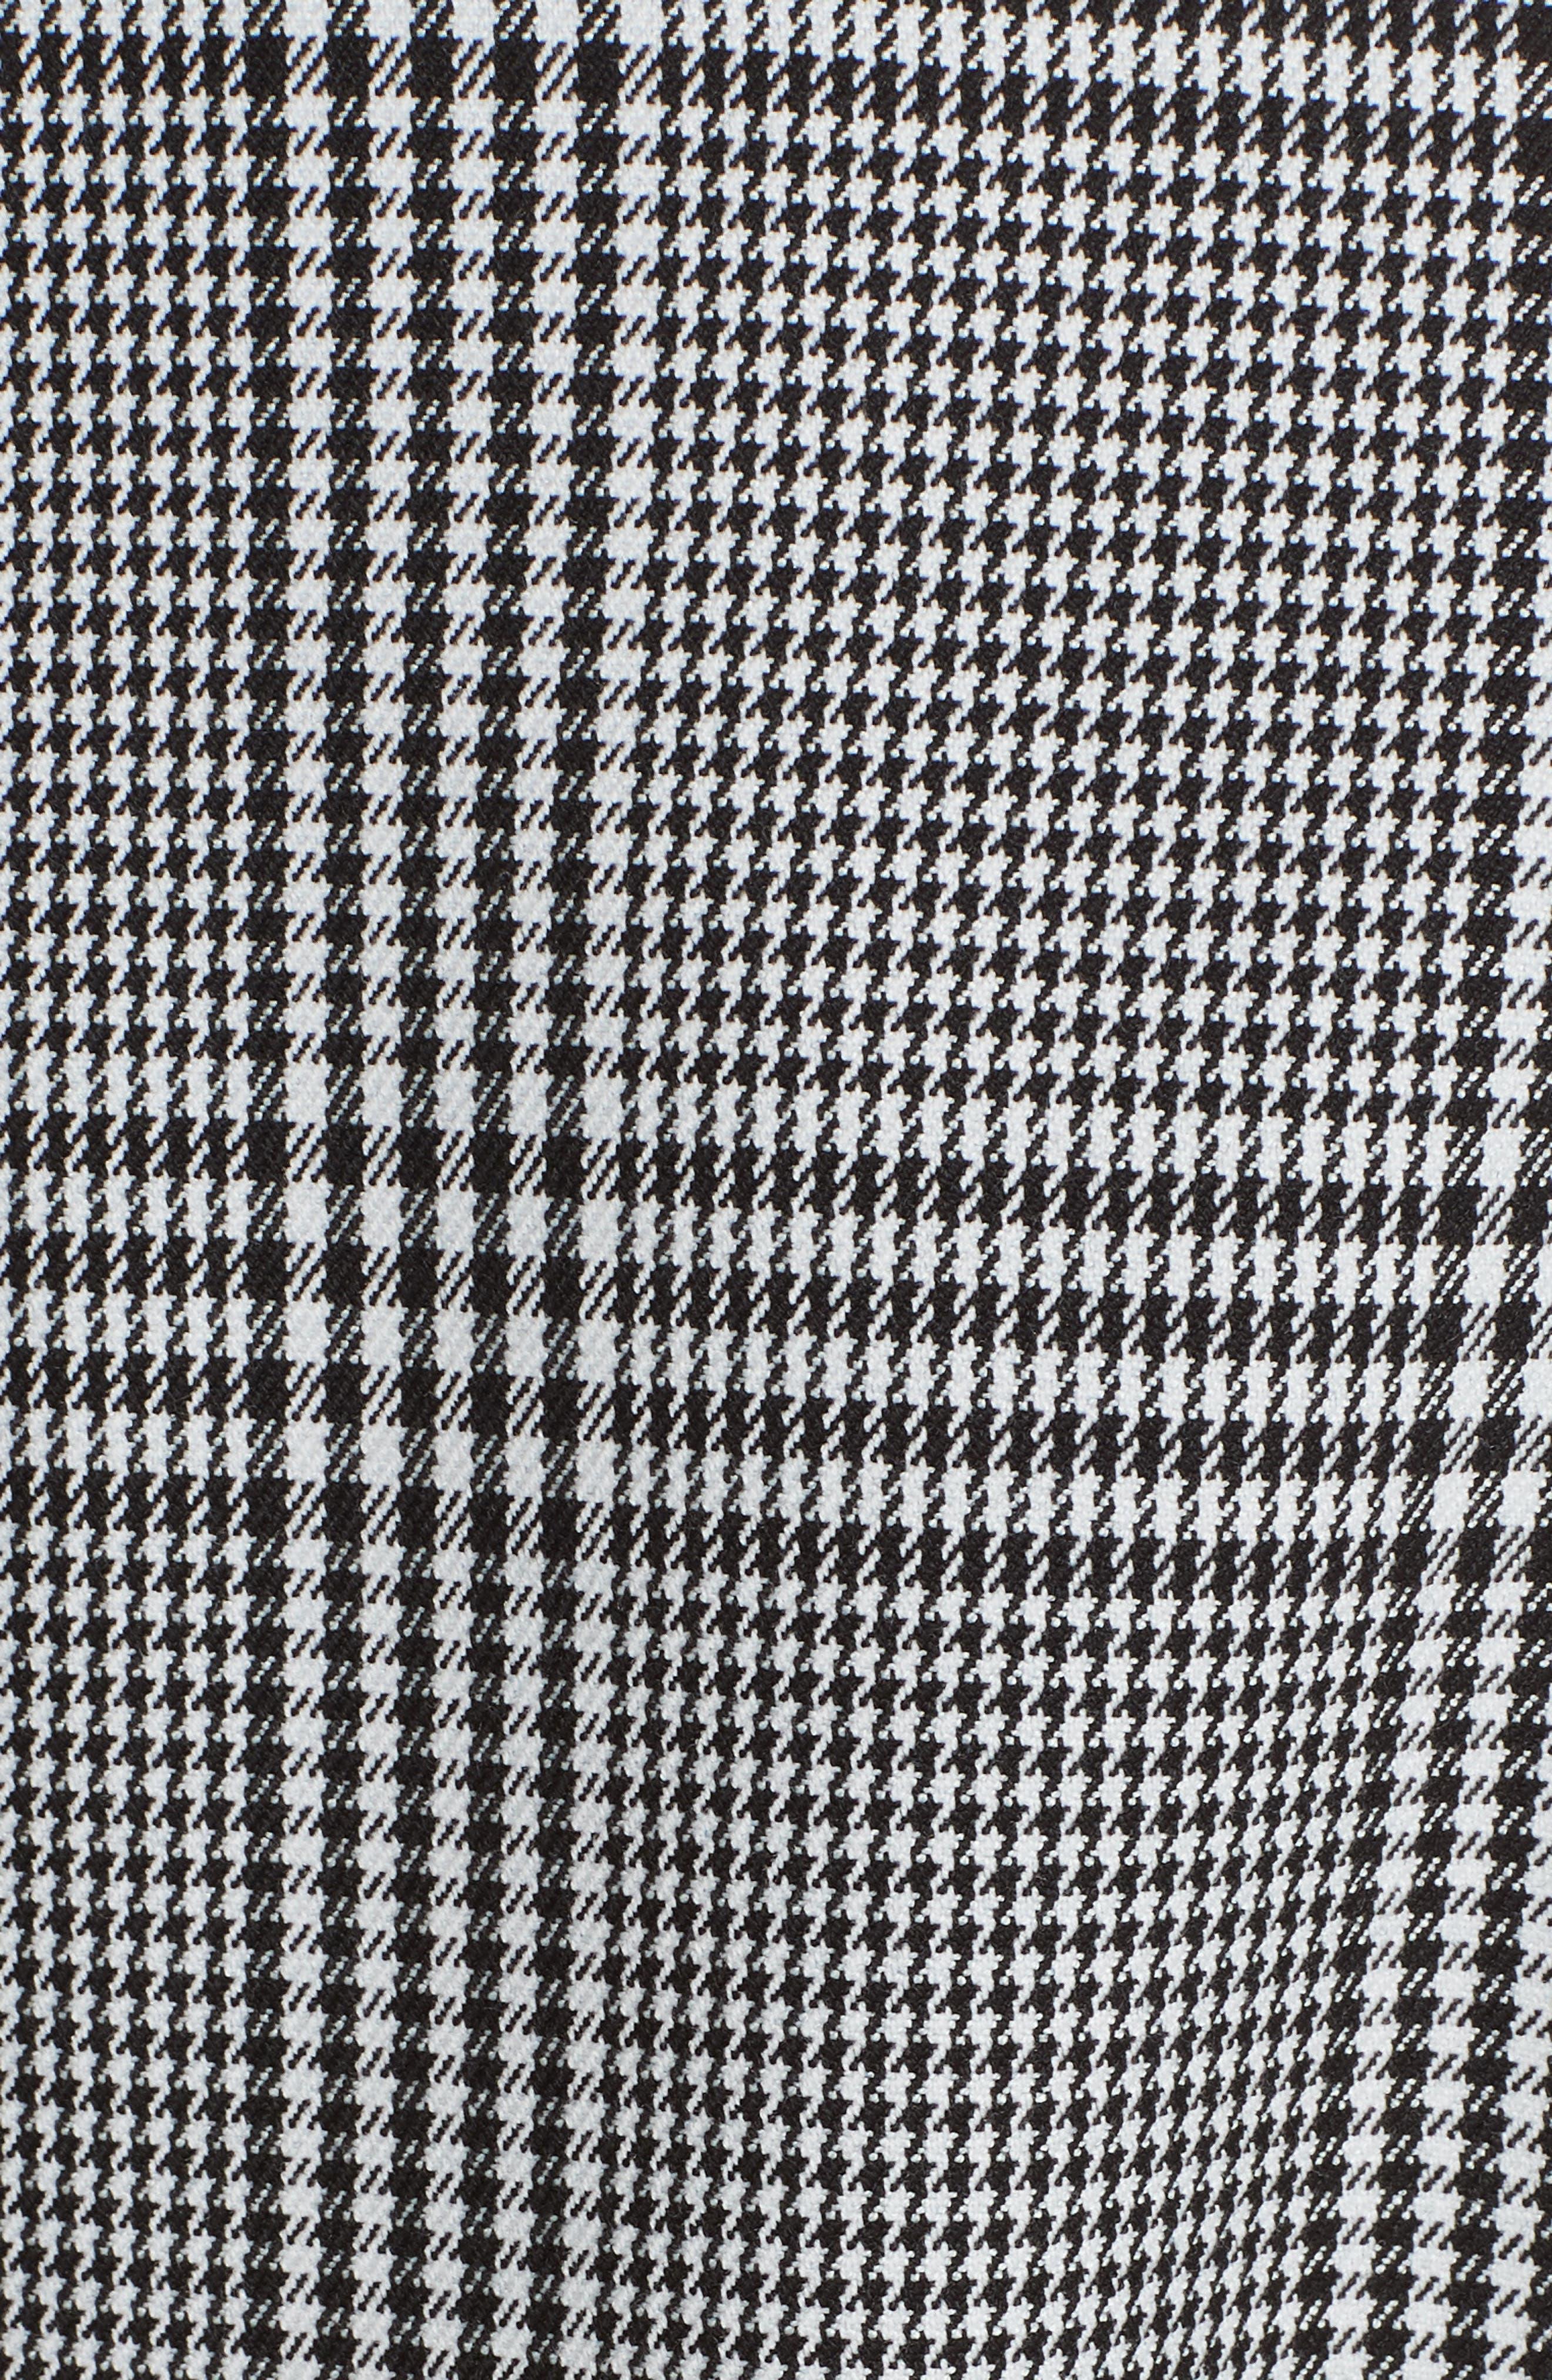 Jemaromina Glen Plaid Suit Jacket,                             Alternate thumbnail 6, color,                             020